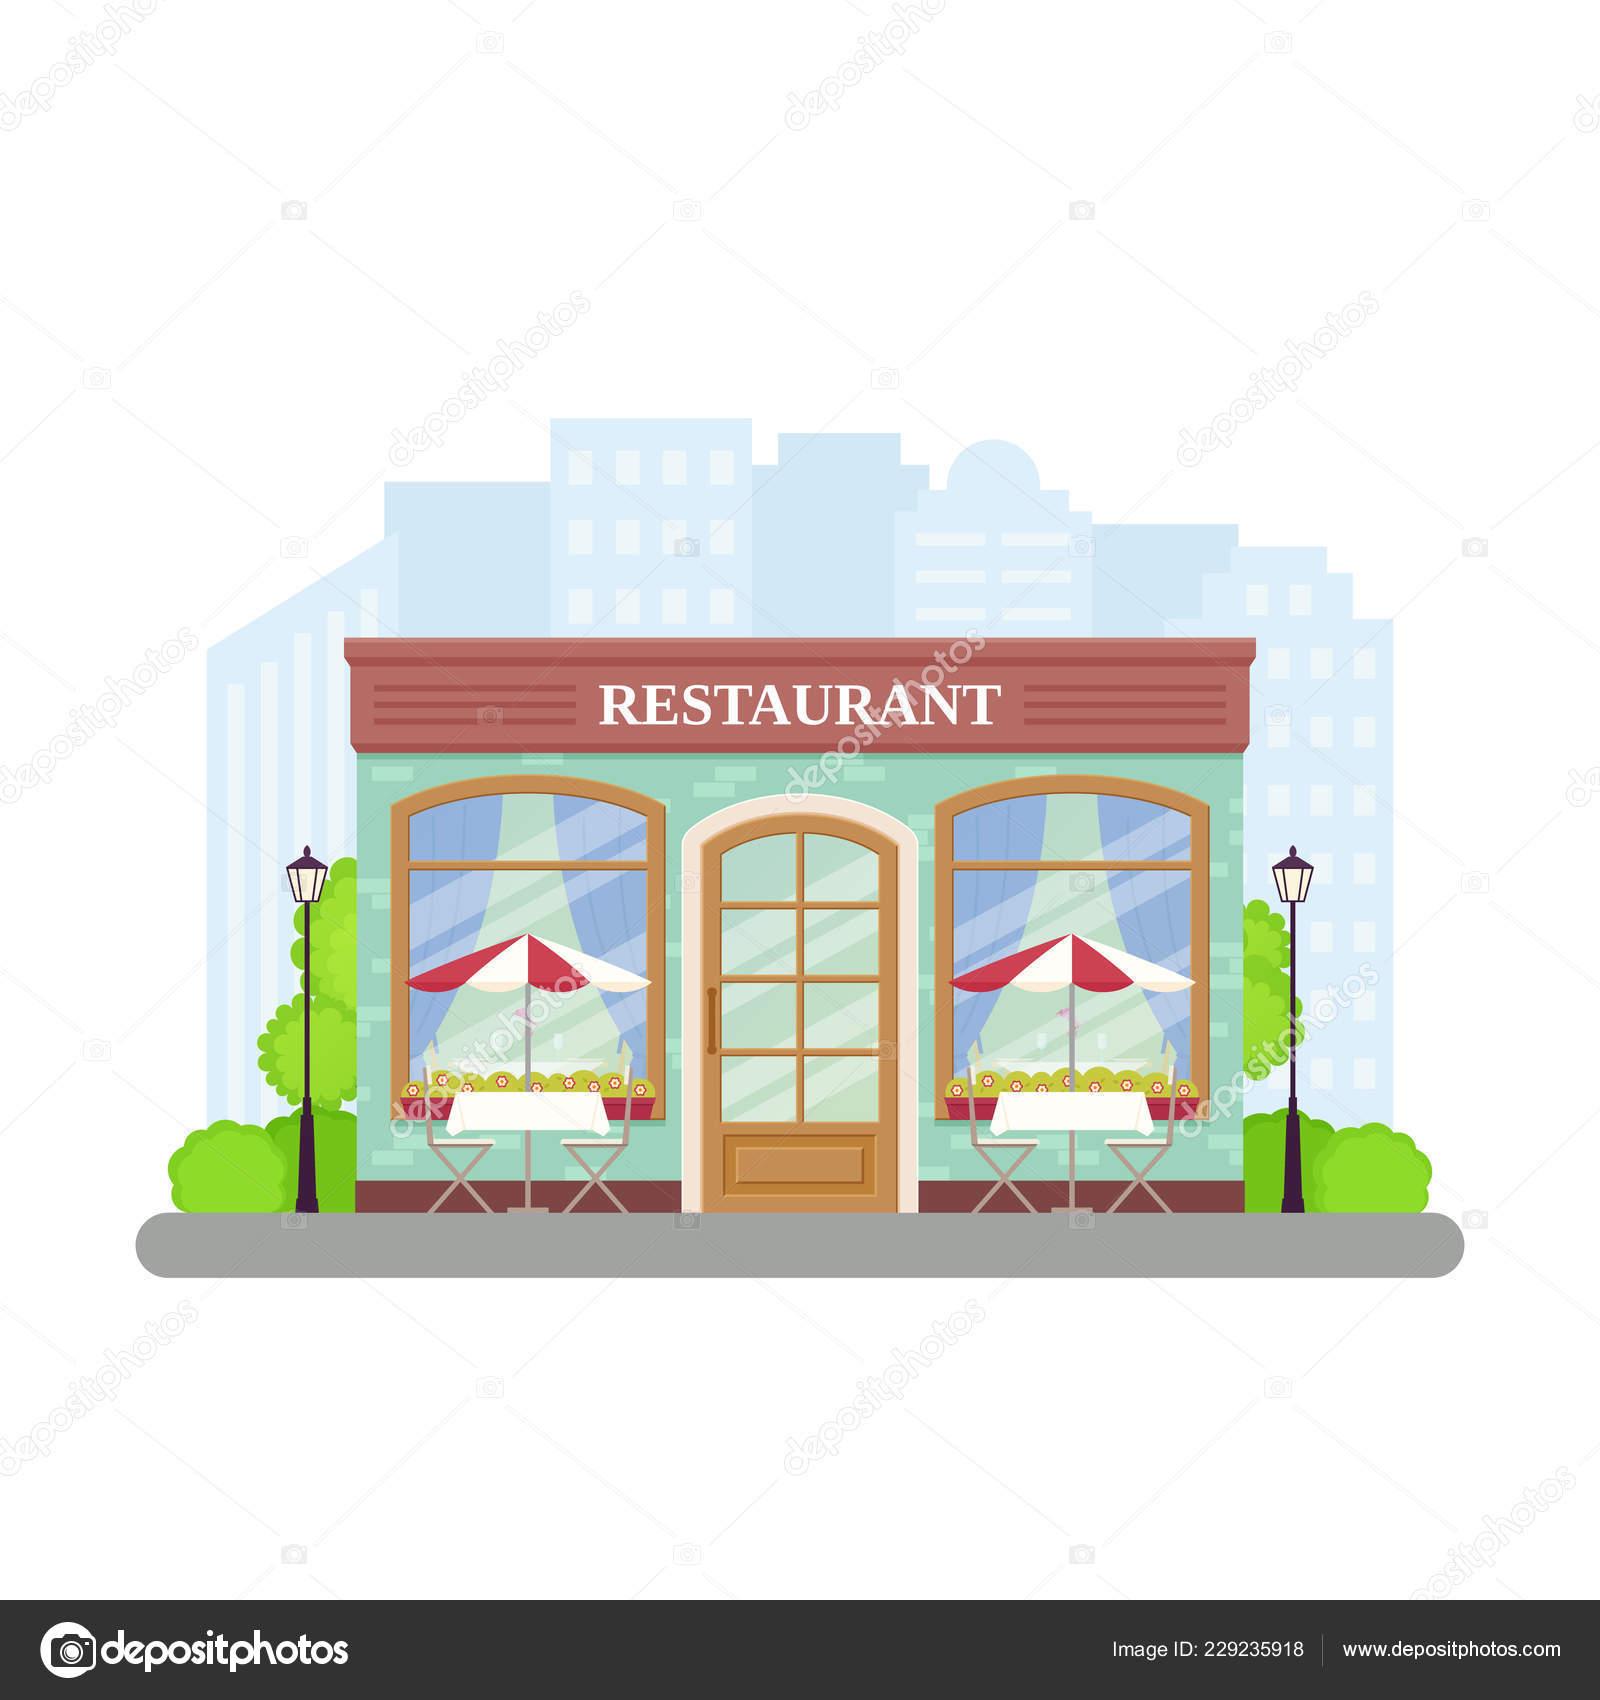 Restaurant Vector Street Cafe Shop Building Facade Storefront Vintage Store Stock Vector C Maradaisy 229235918